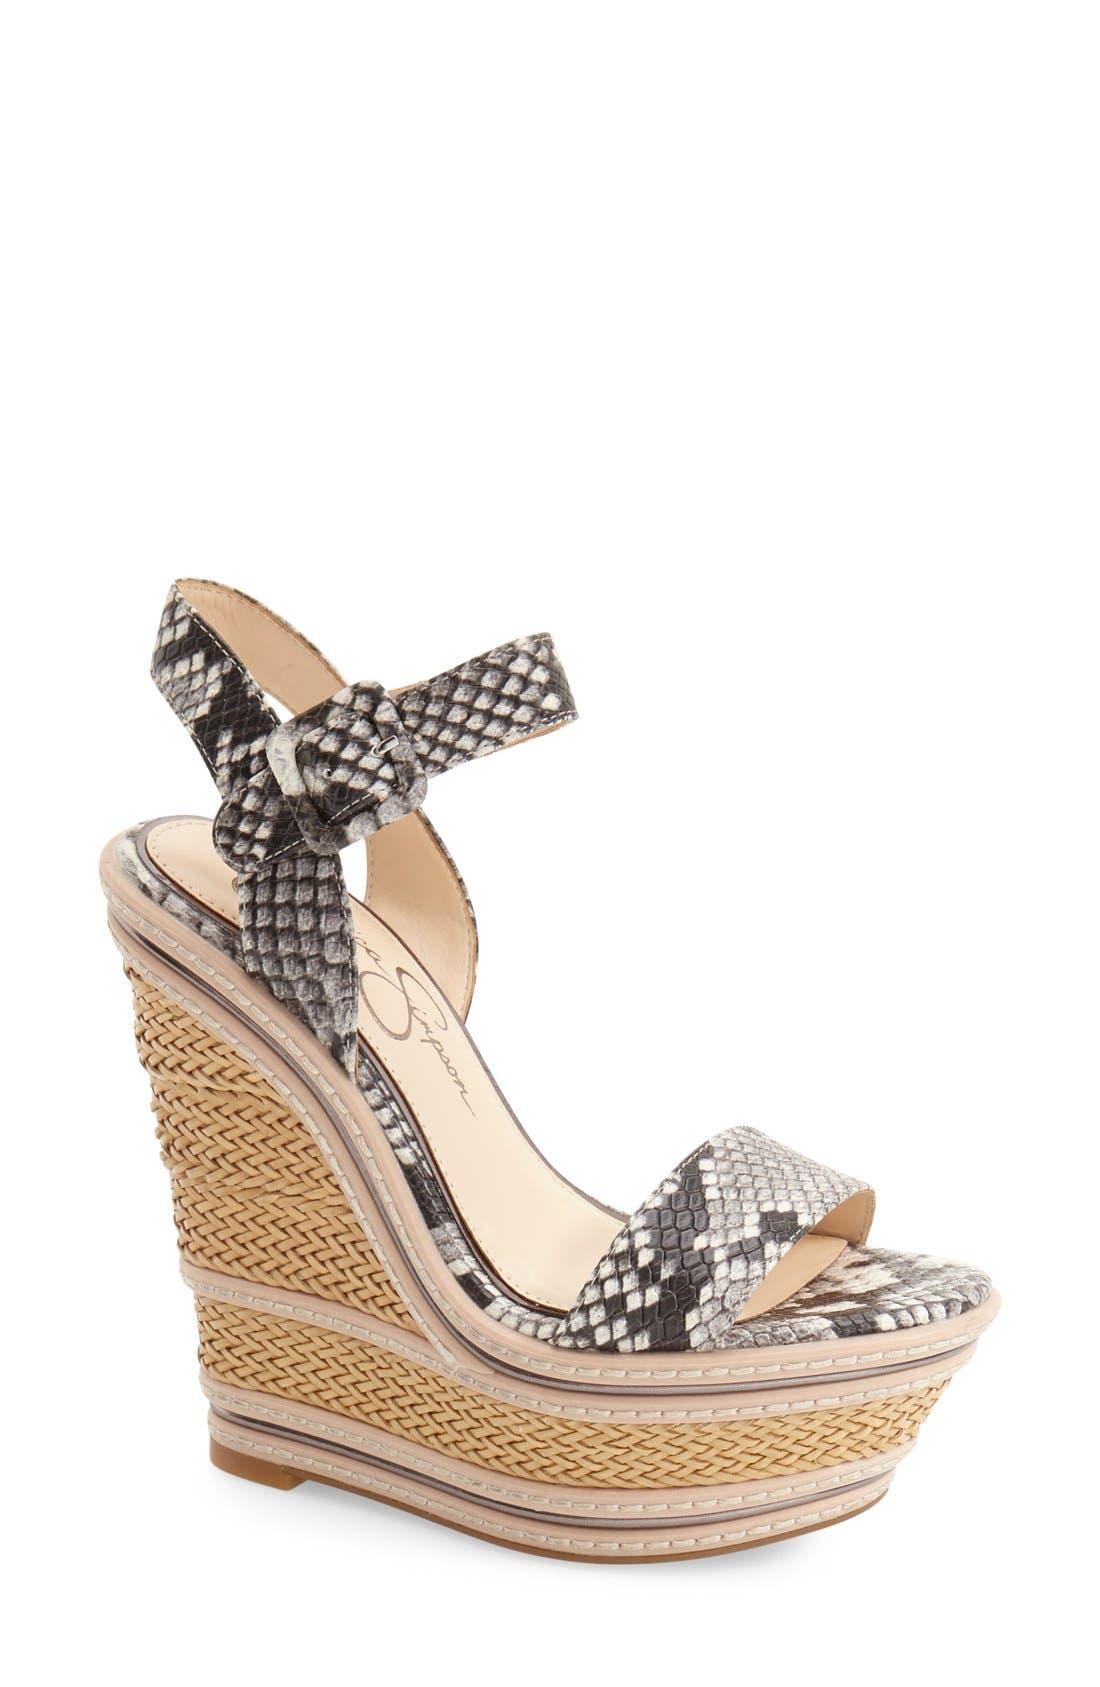 Main Image - Jessica Simpson 'Ayala' Wedge Sandal (Women)